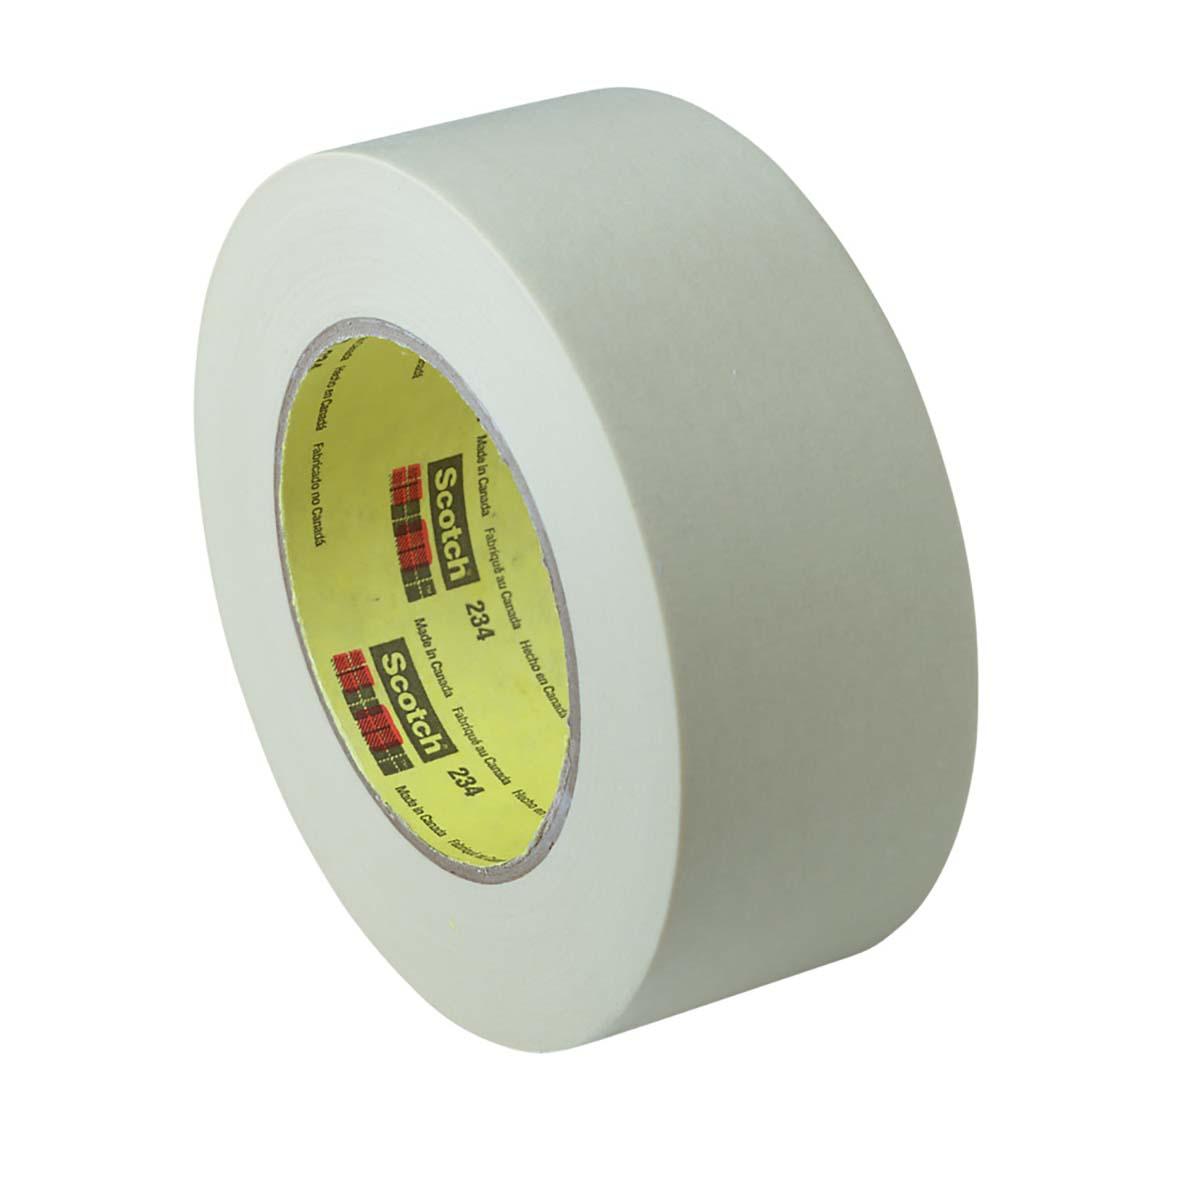 3M General Purpose Masking Tape 234 Tan, 18 mm x 55 m 5.9 mil, 48 per case Bulk